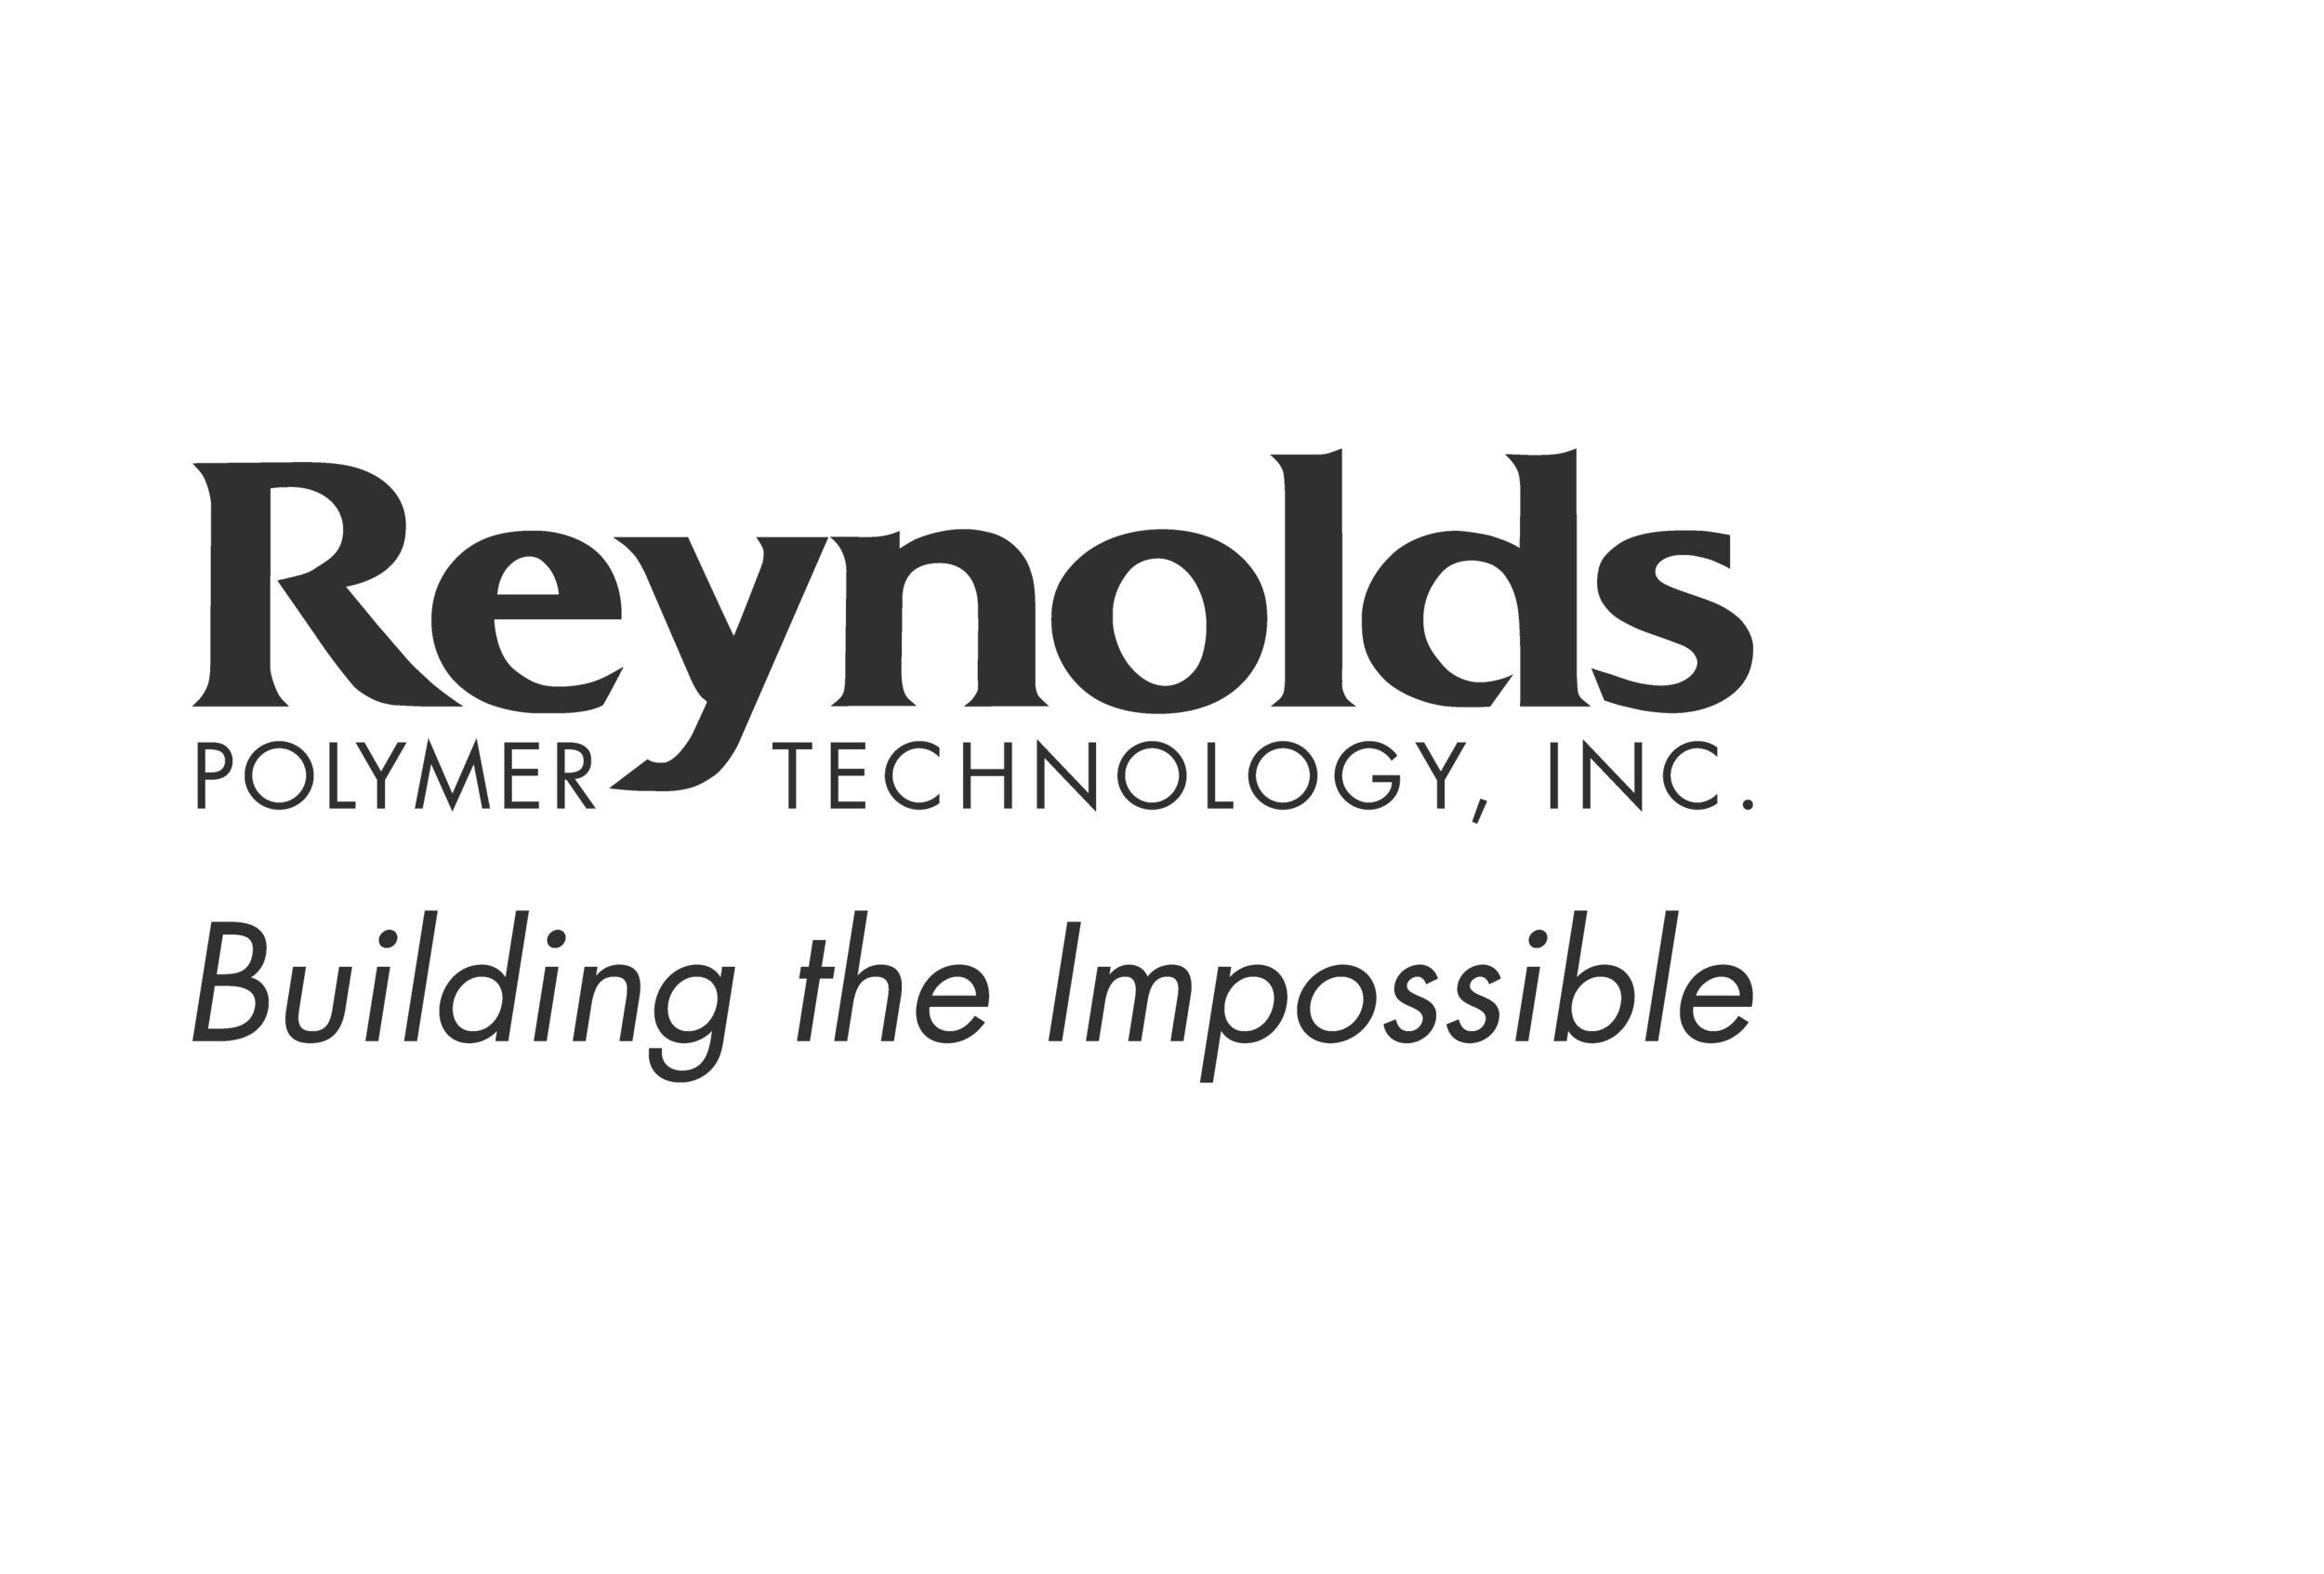 Reynolds-BTI-Master_k.jpg